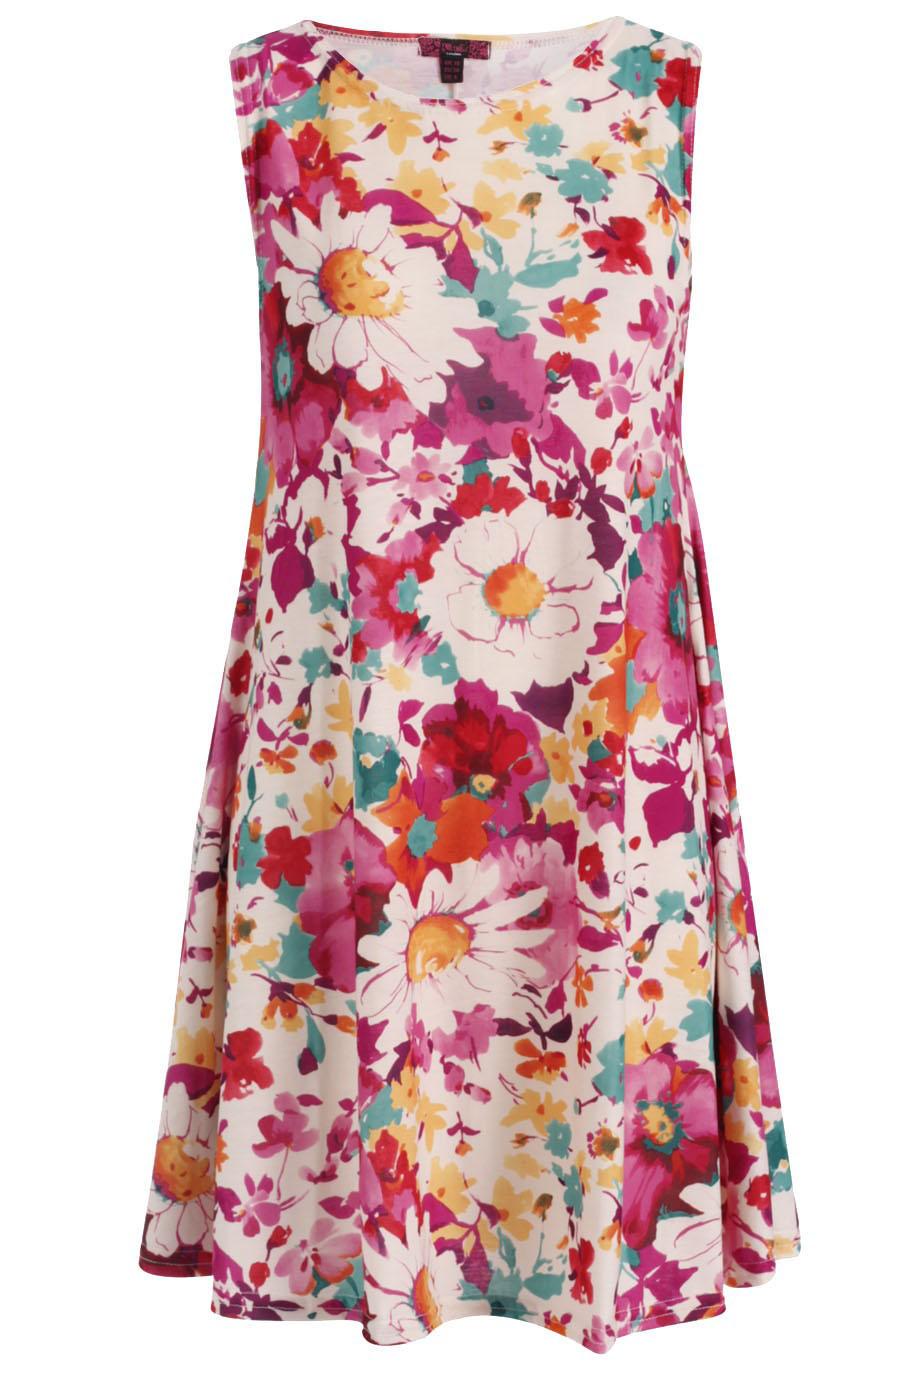 8873c86320f7 happy floral swing φόρεμα τουνίκ